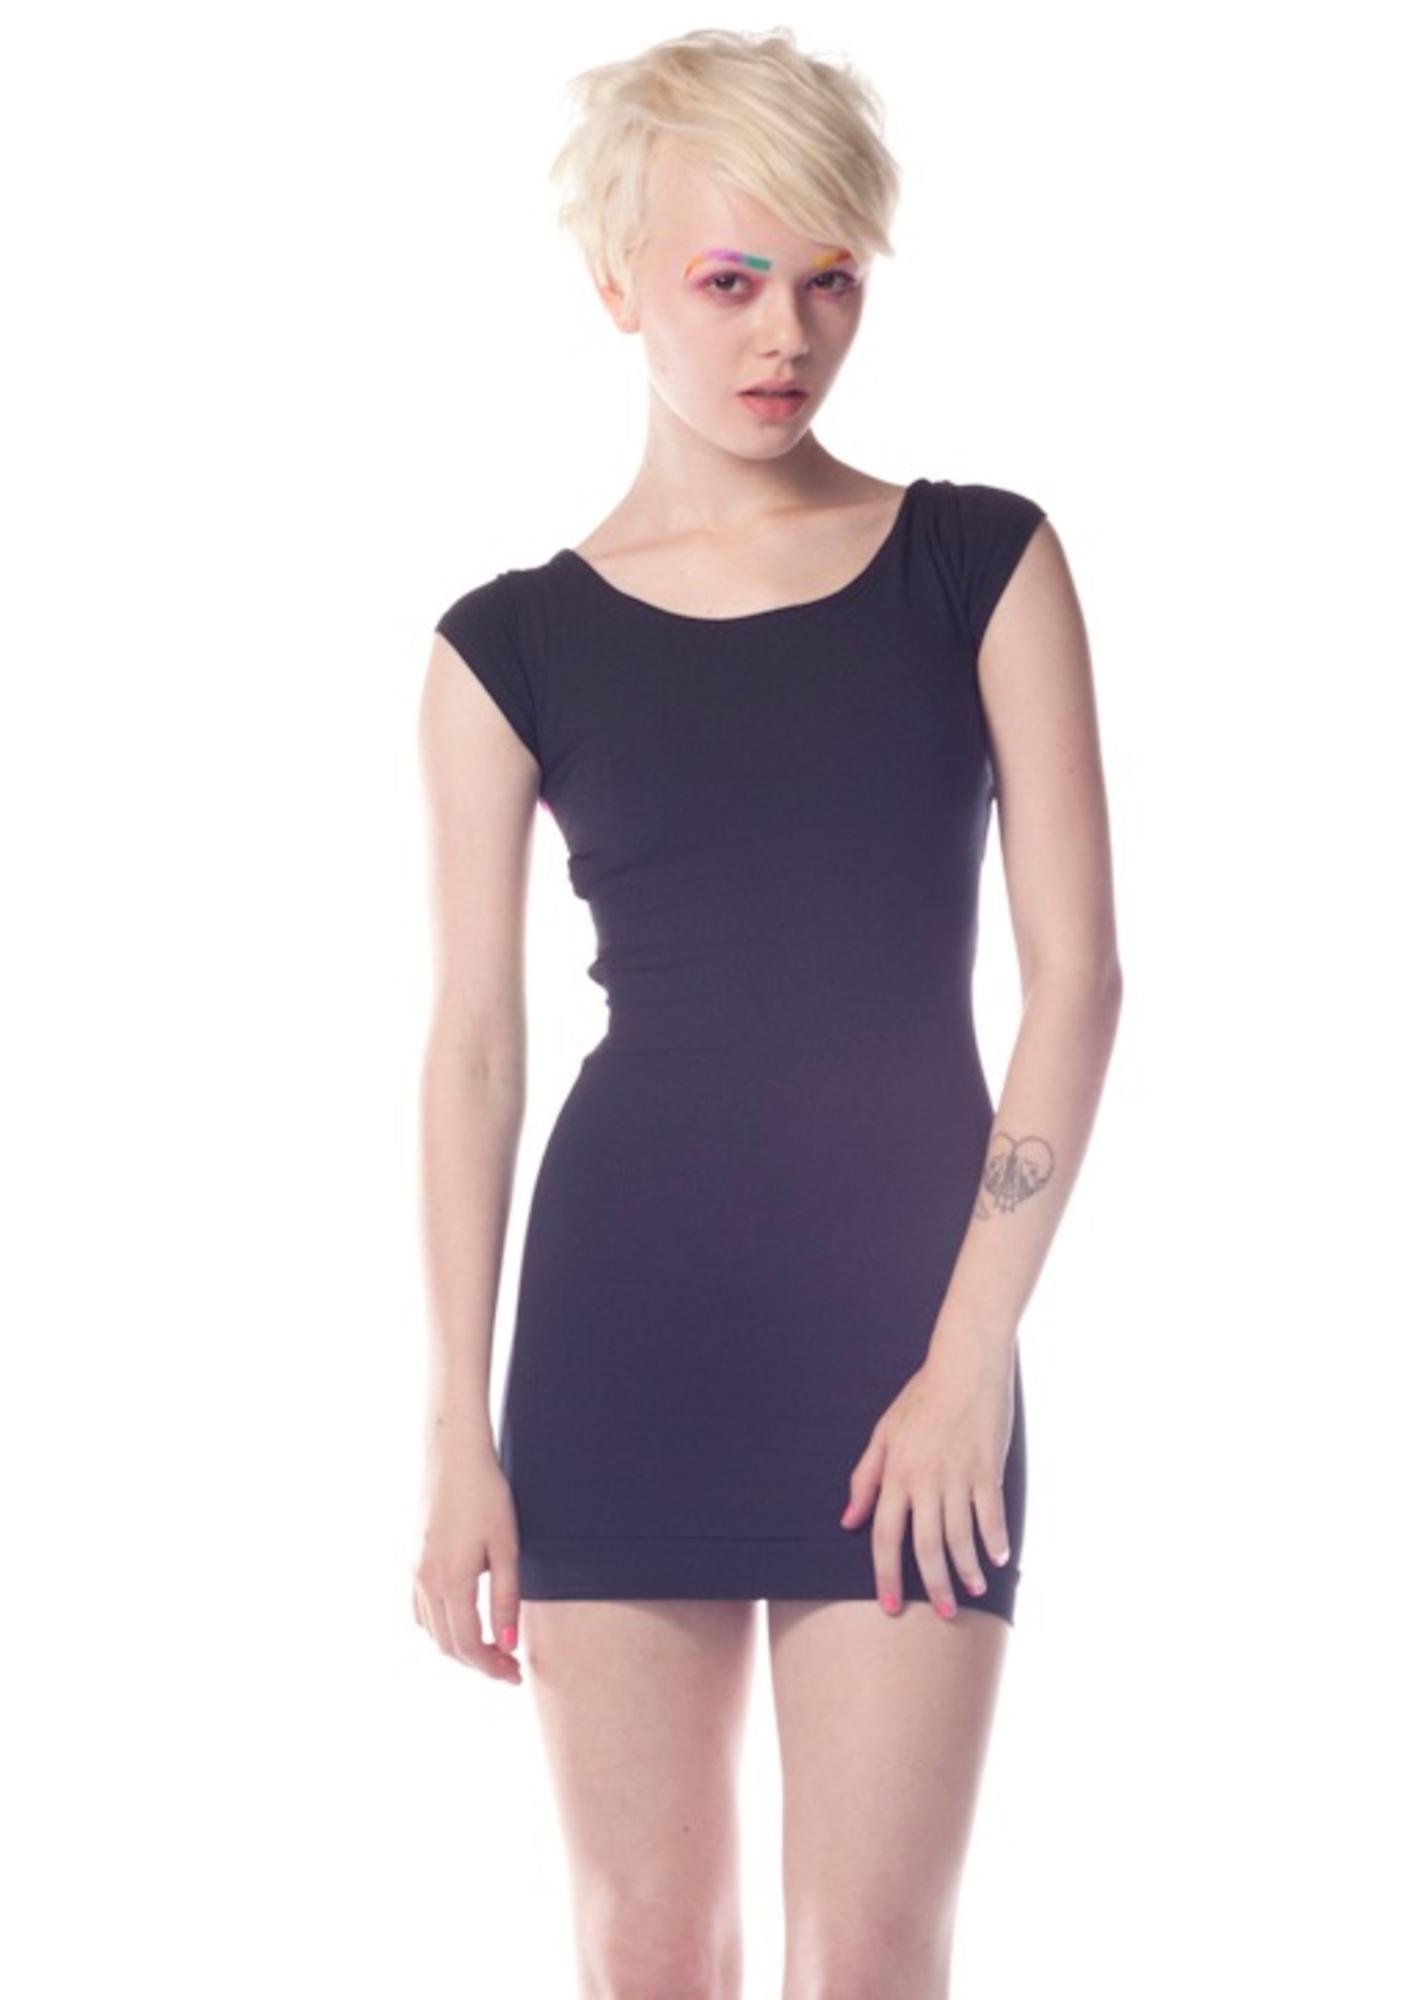 Quontum Original Strappy Back Dress